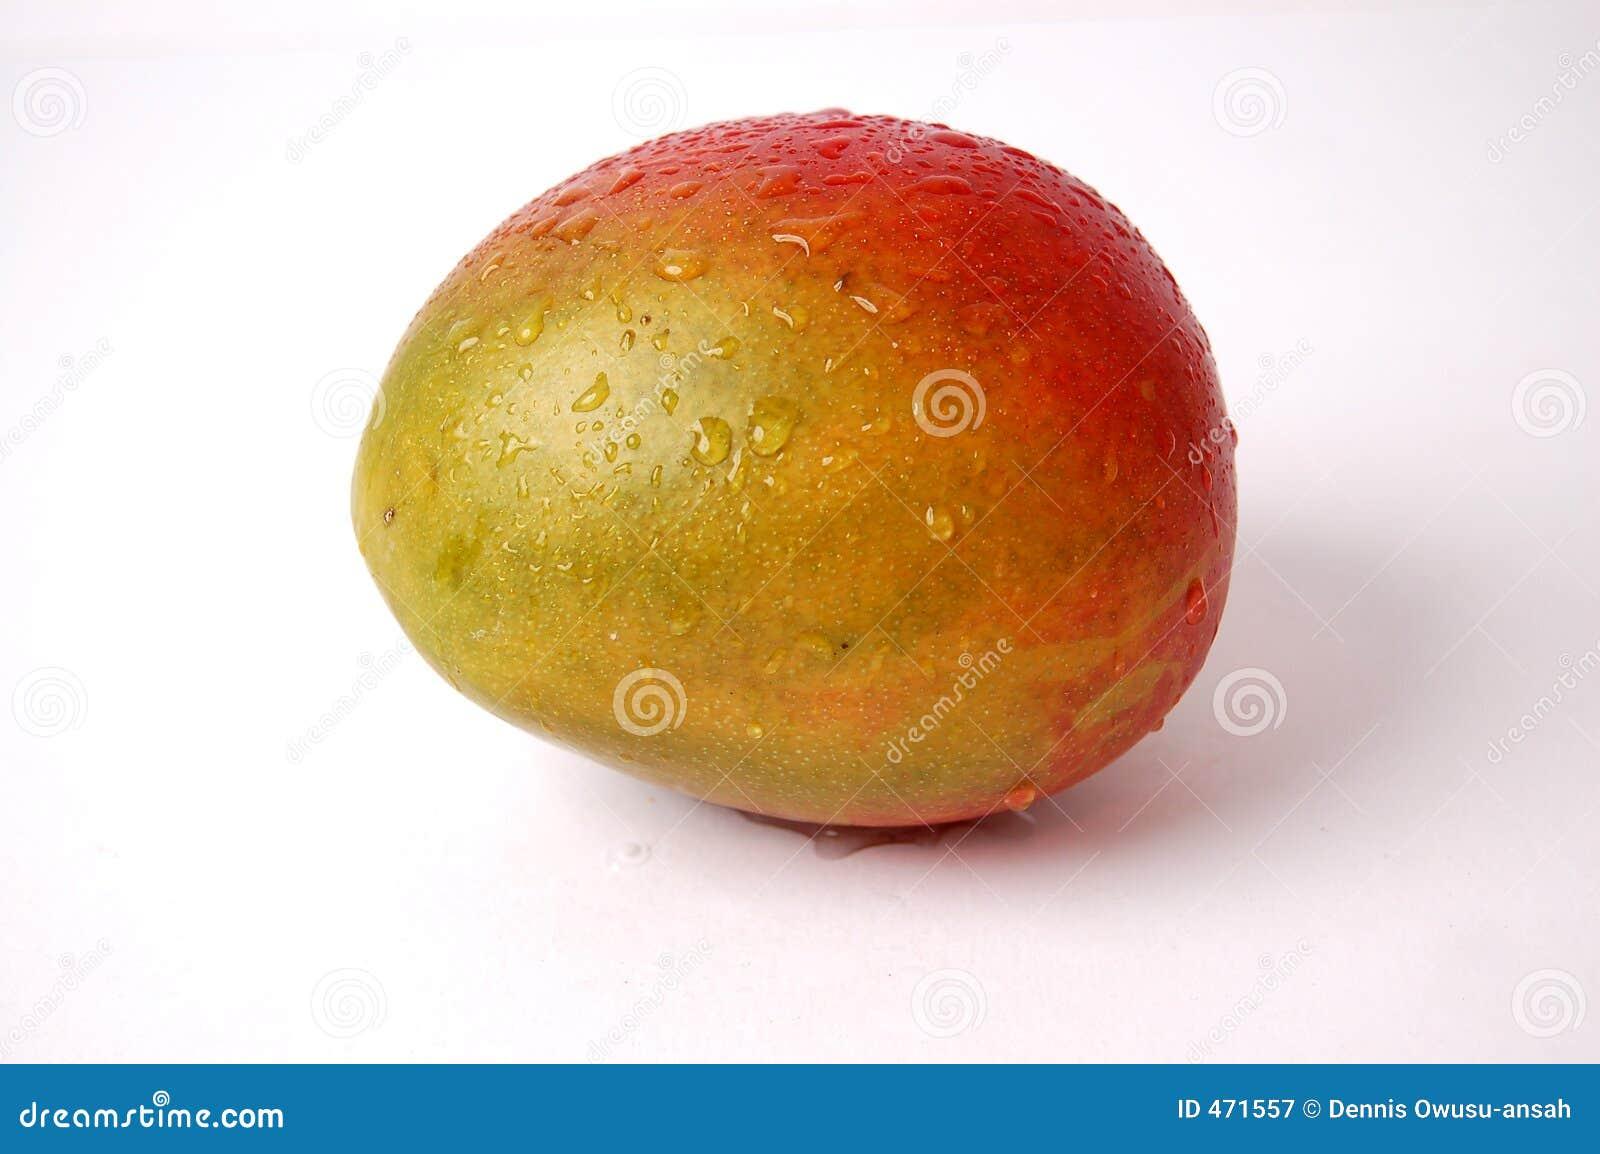 Wet Juicy Mango